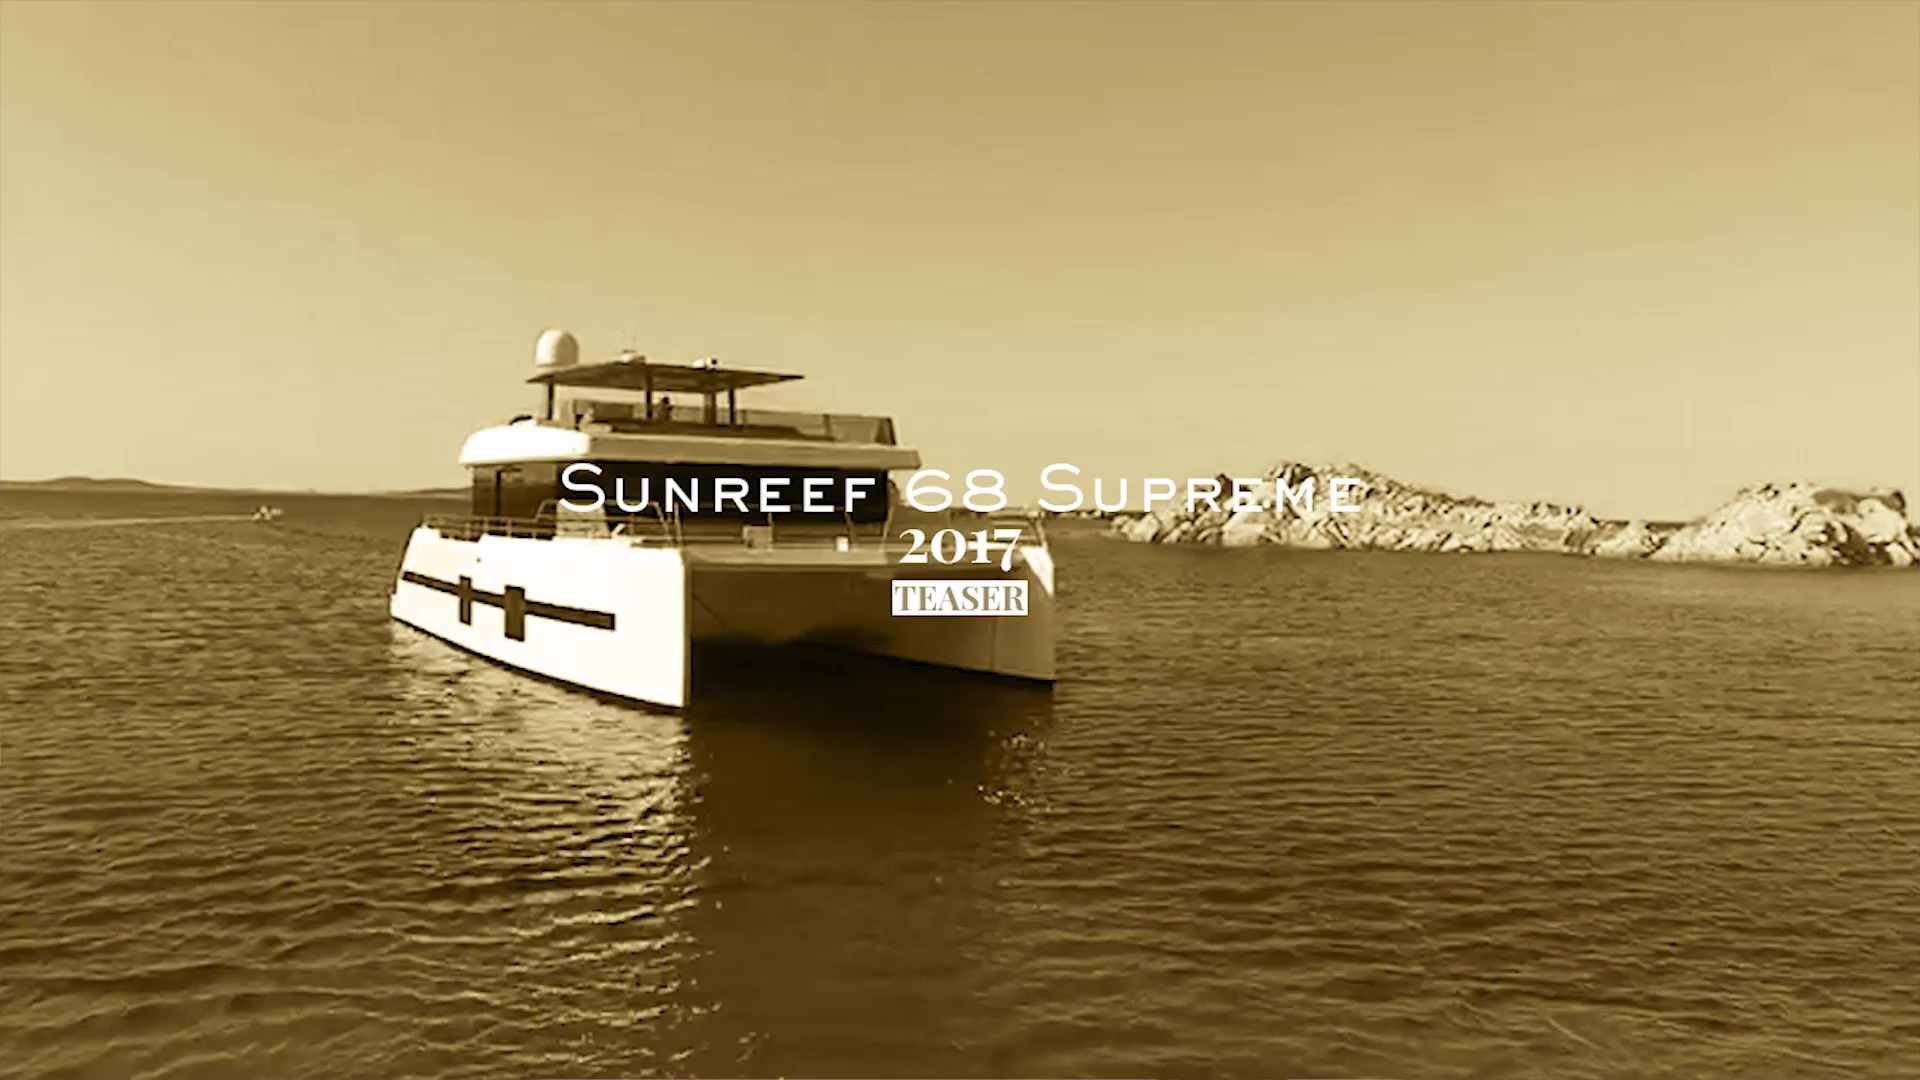 Sunreef 68 Teaser by breezeYachting